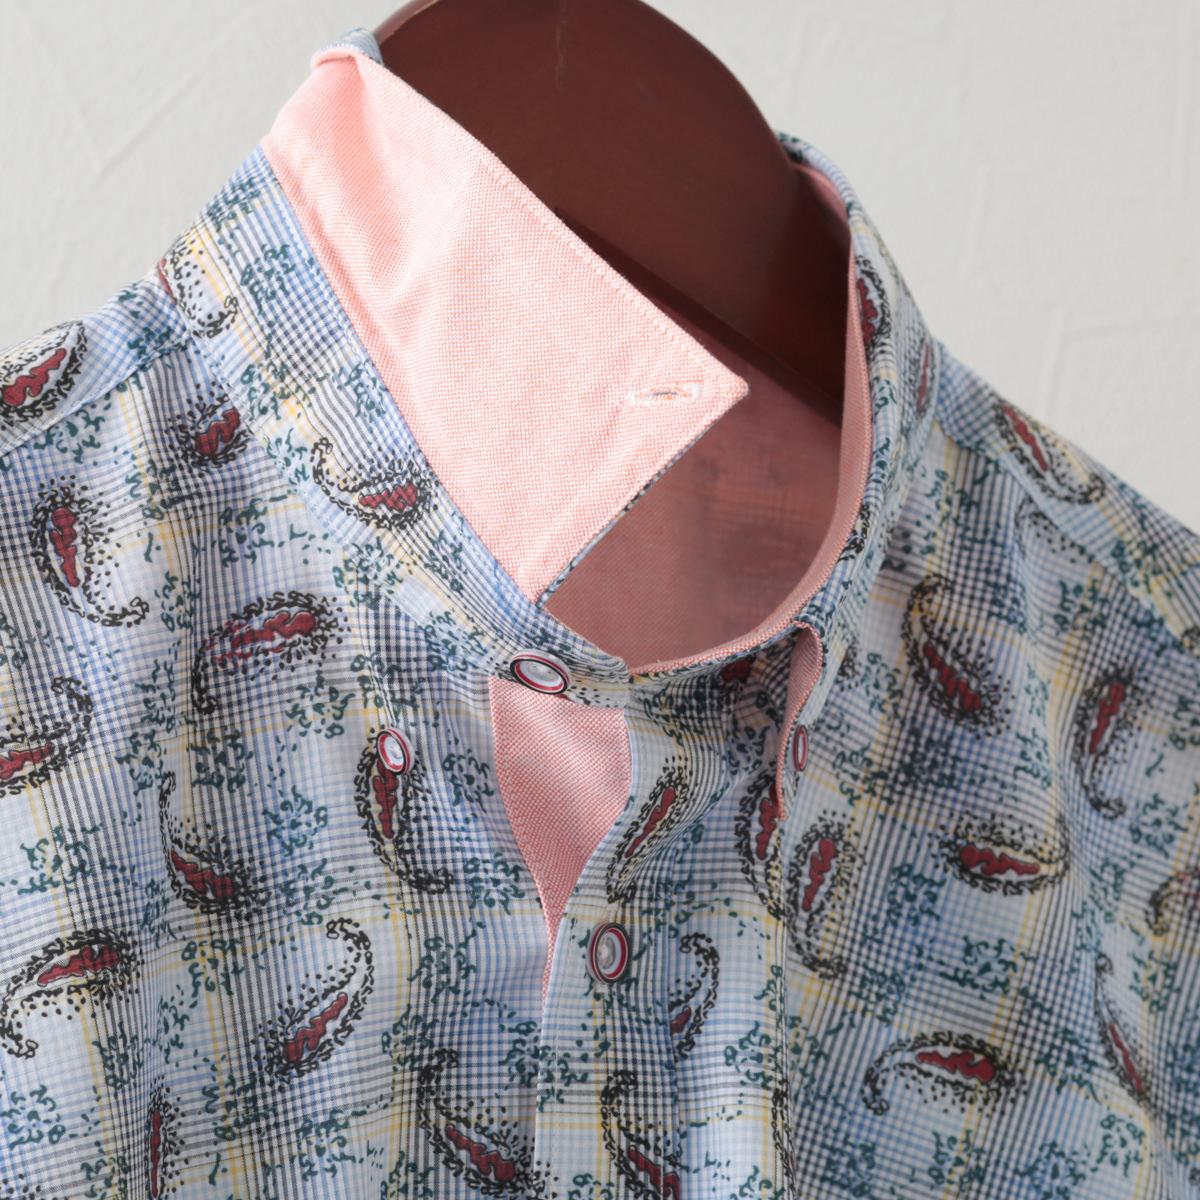 Gabicci メンズ 半袖シャツ ペイズリー チェック ガビッチ コロン レトロ モッズファッション